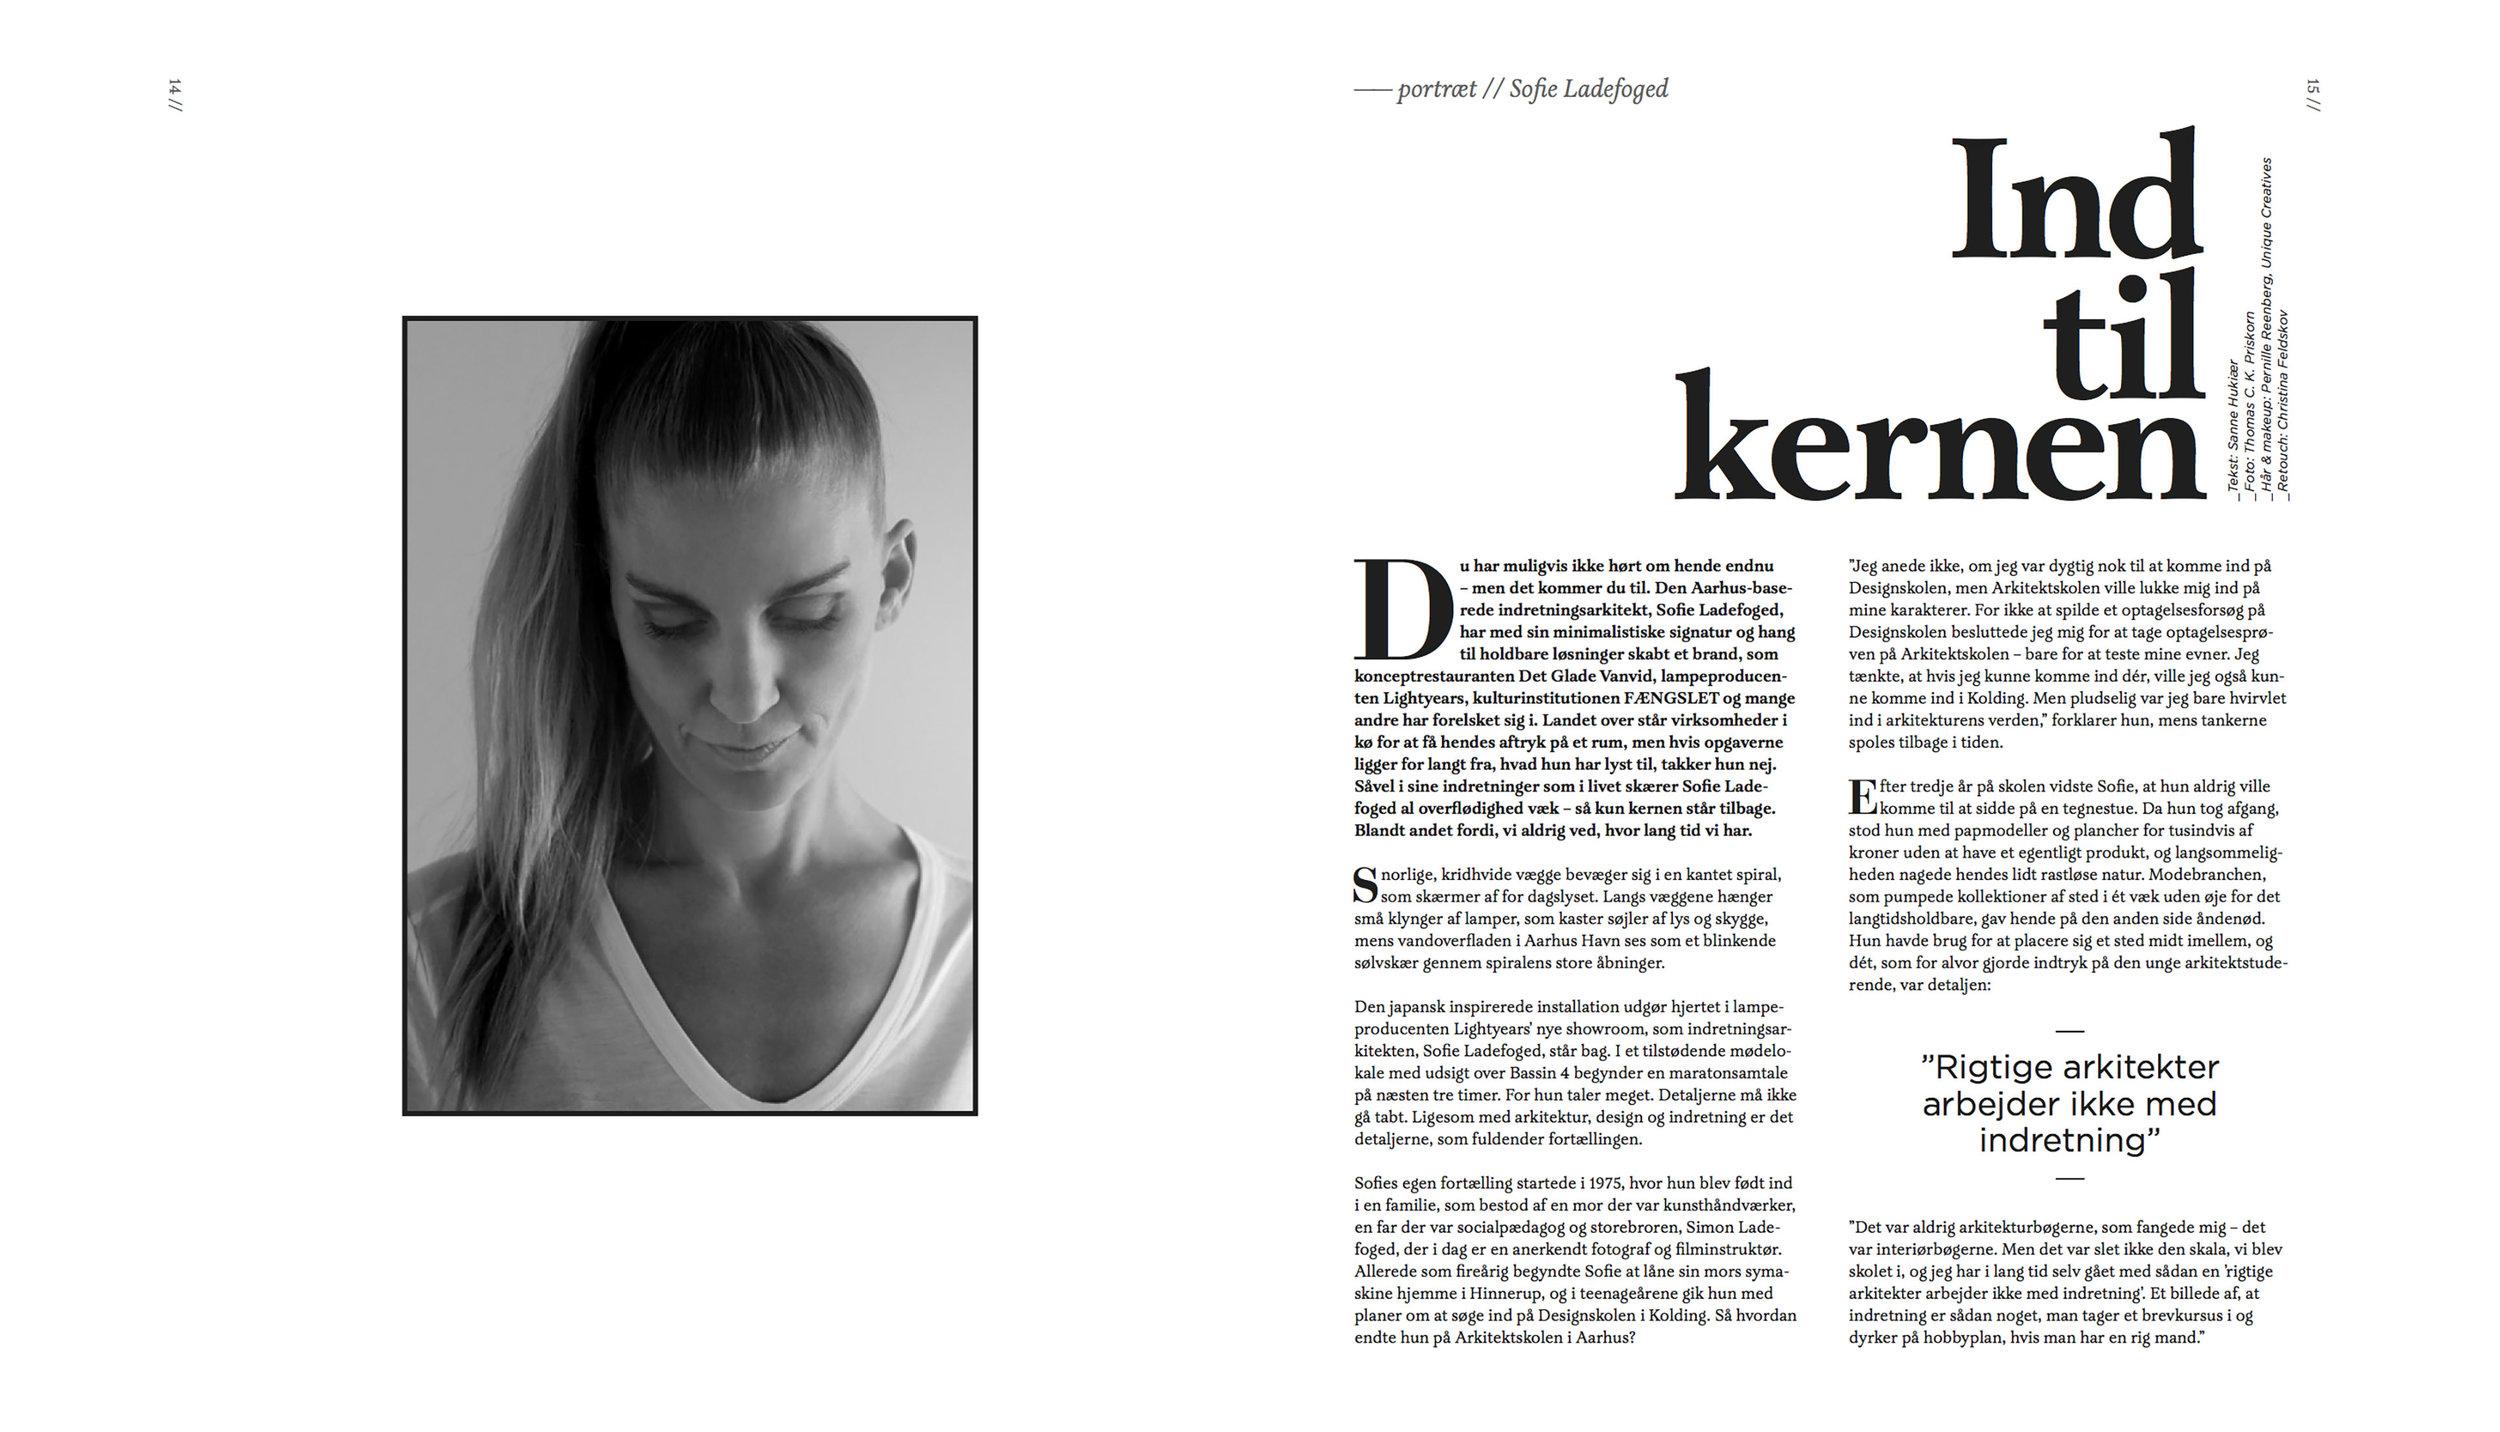 sofie-ladefoged-press-note-magazine-2014-page-02.jpg